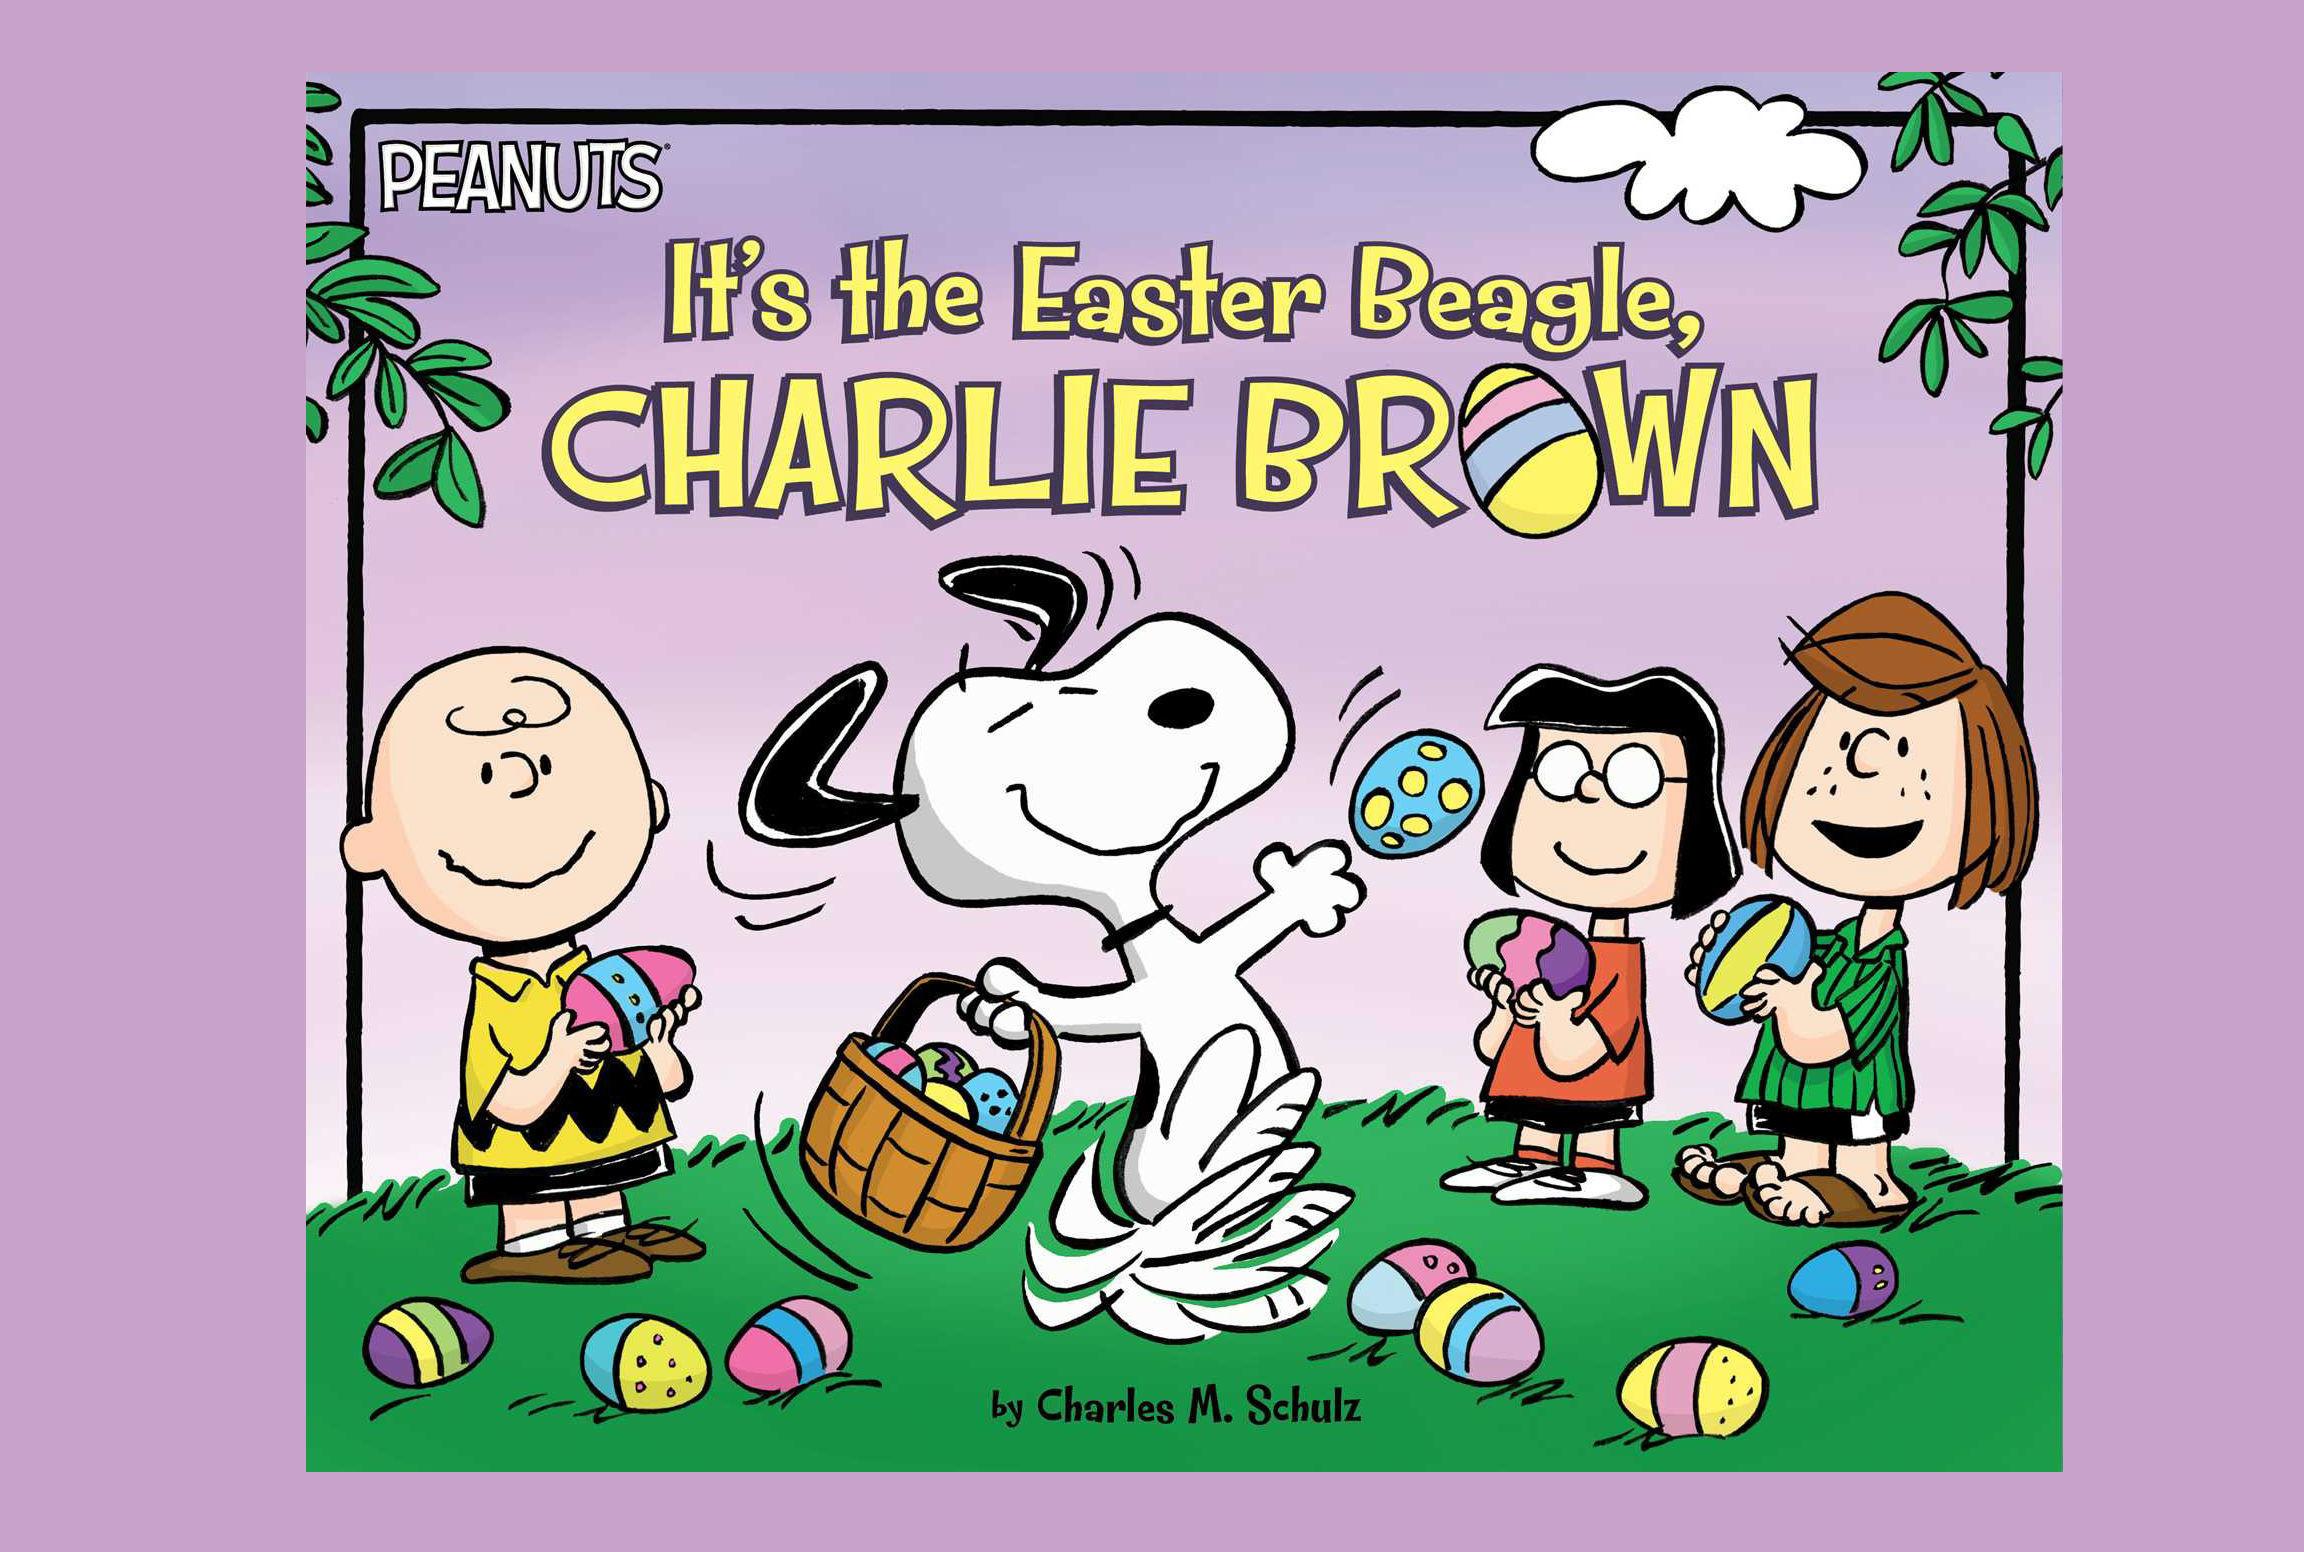 Peanuts Easter Wallpaper 54 images 2304x1552